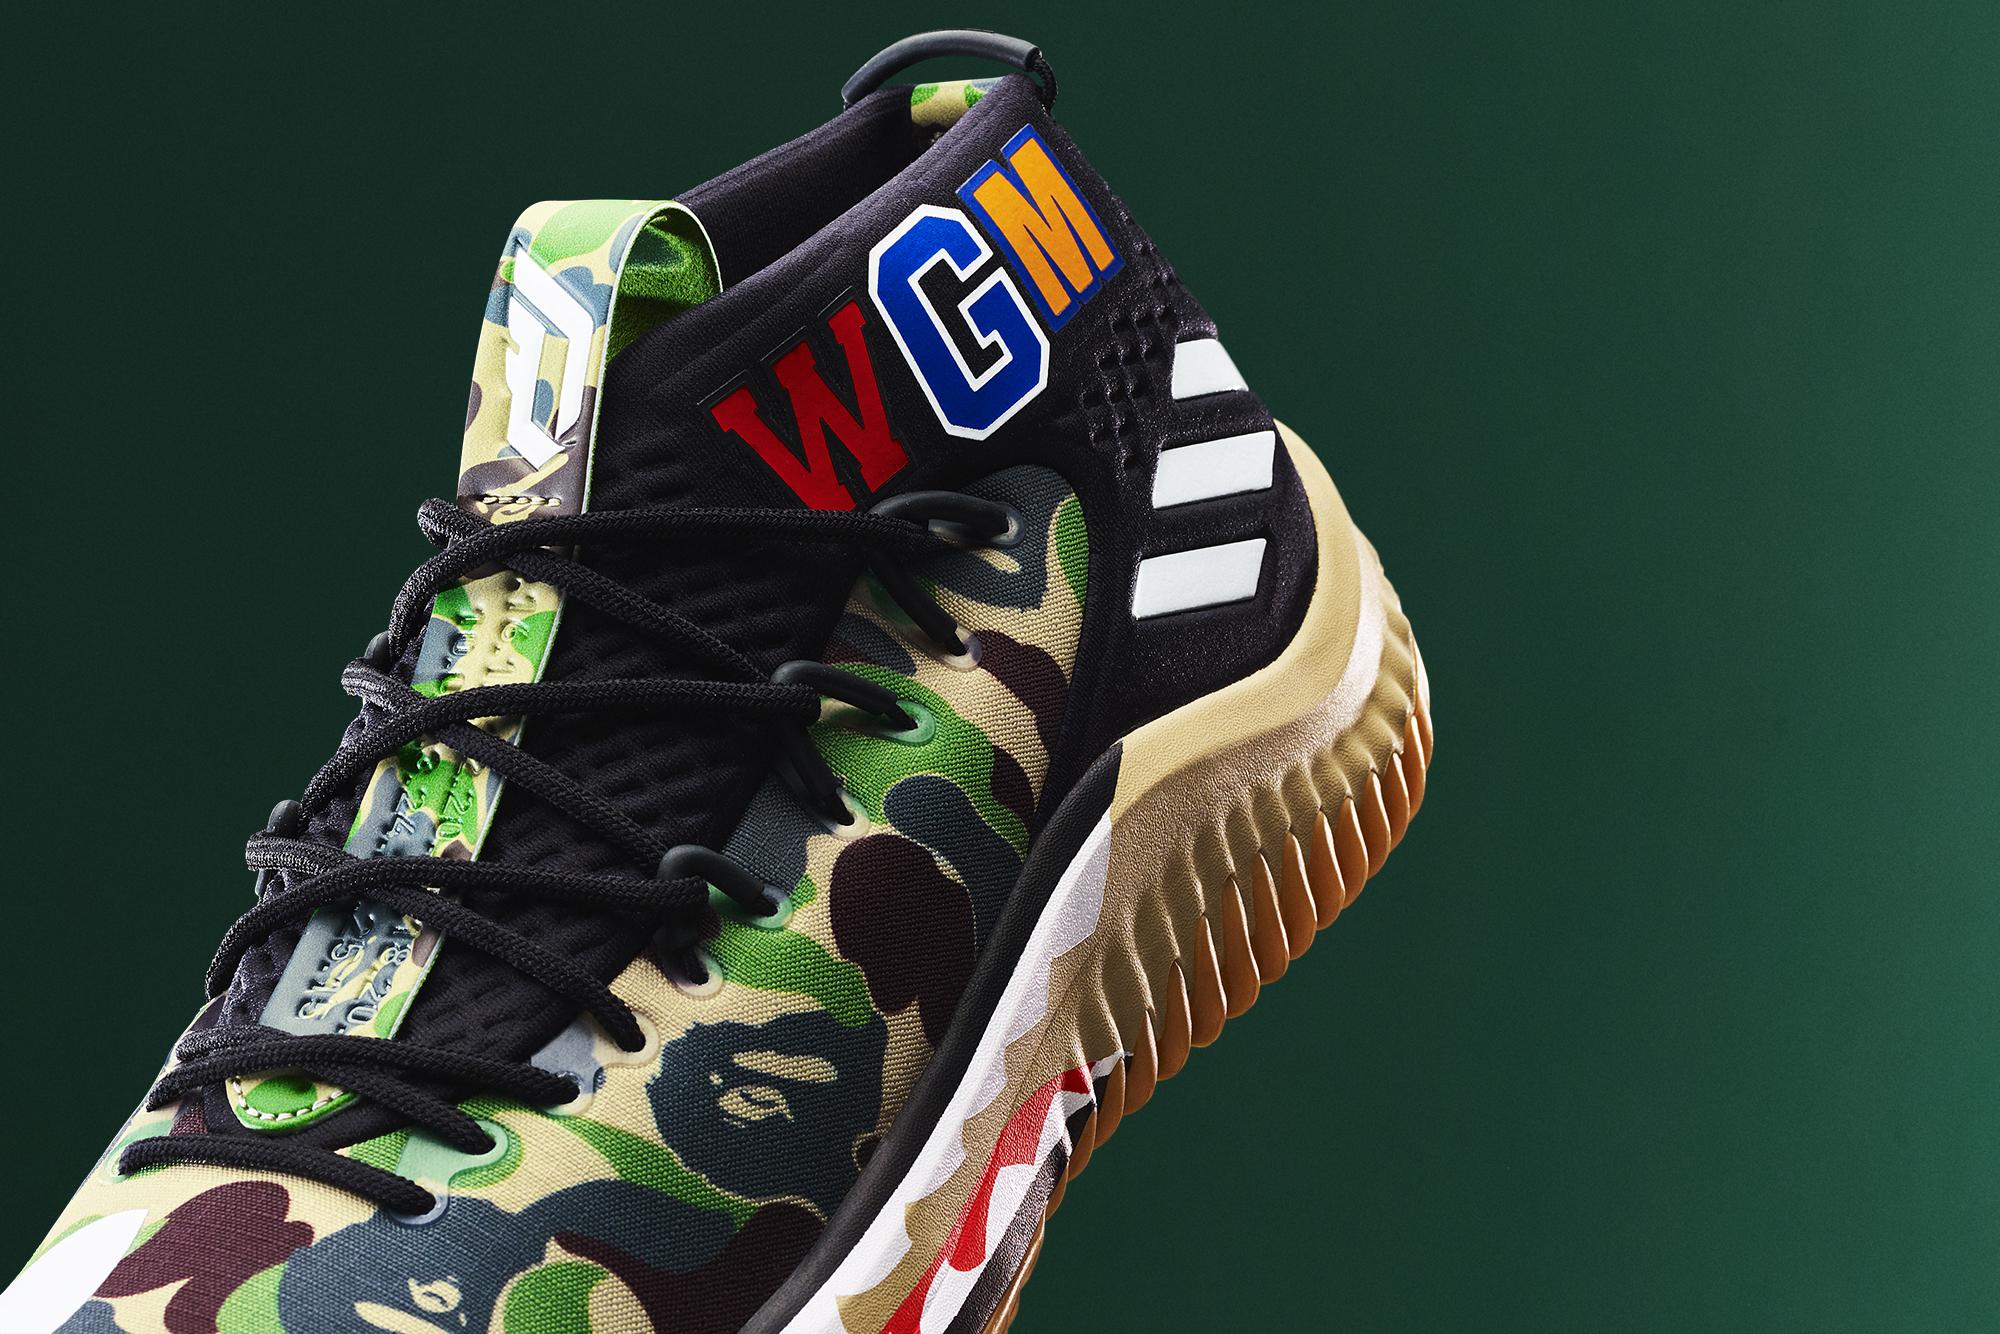 「adidas Basketball」と「A BATHING APE®」のコラボレーションが実現